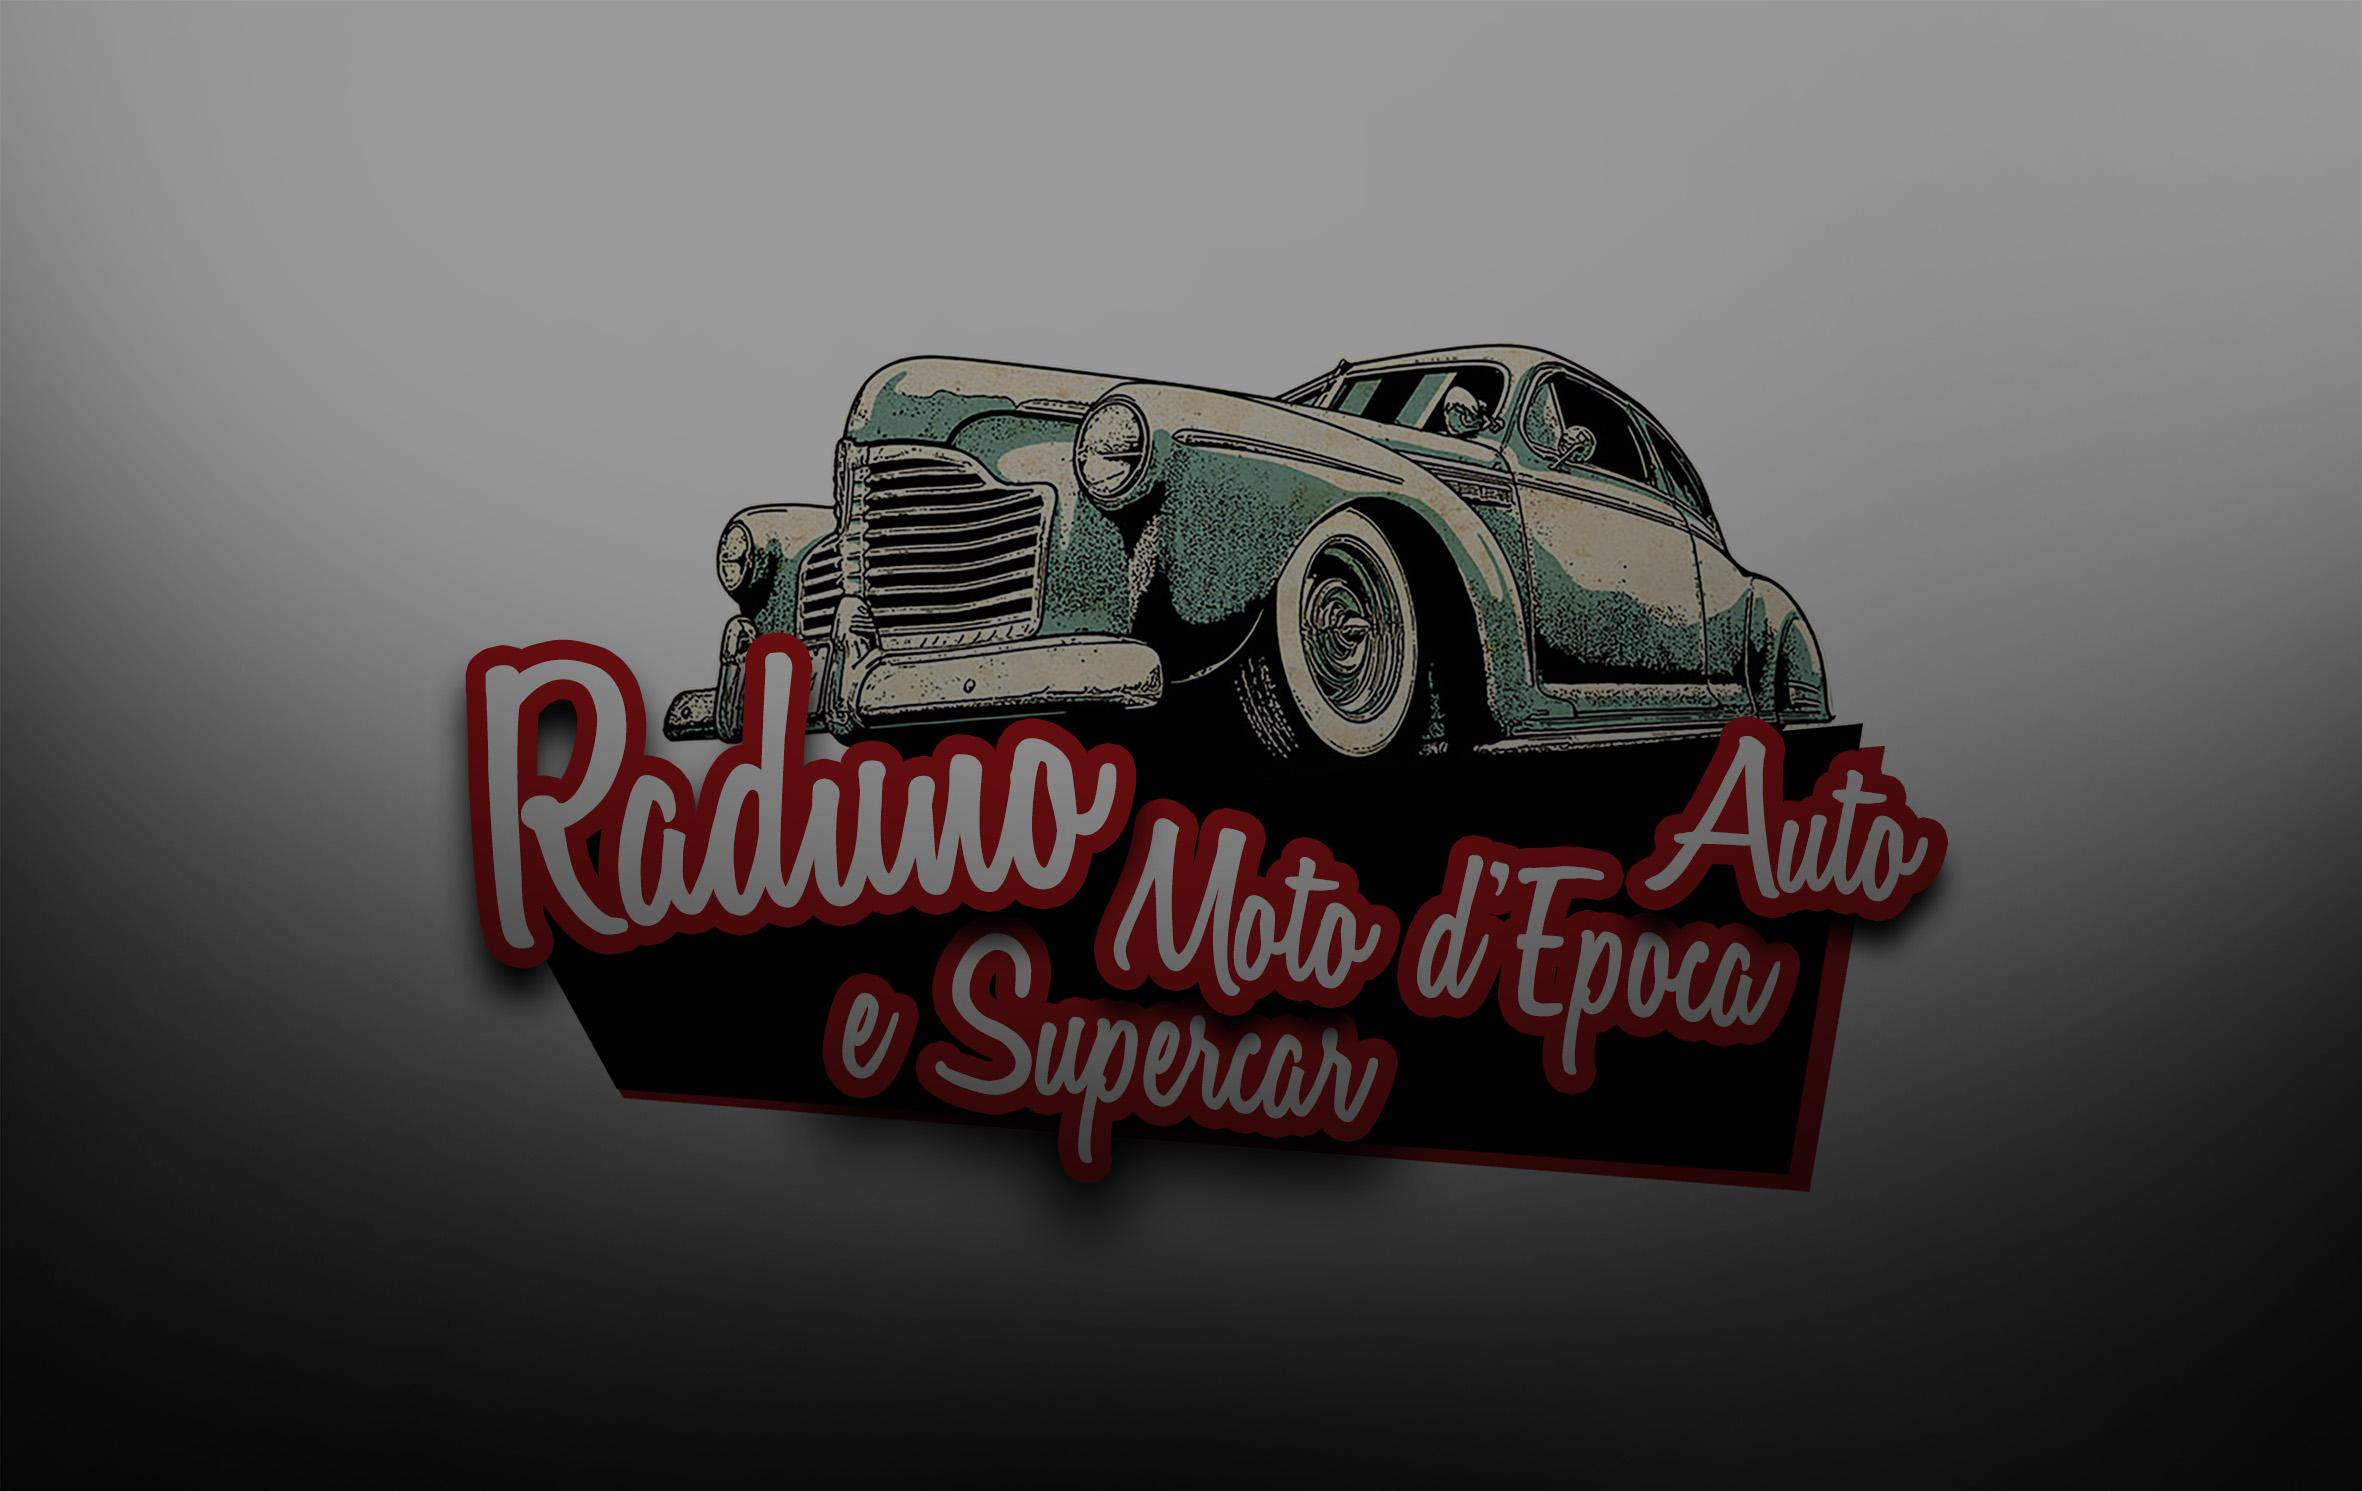 Raduno Auto, Modo d'epoca e Supercar